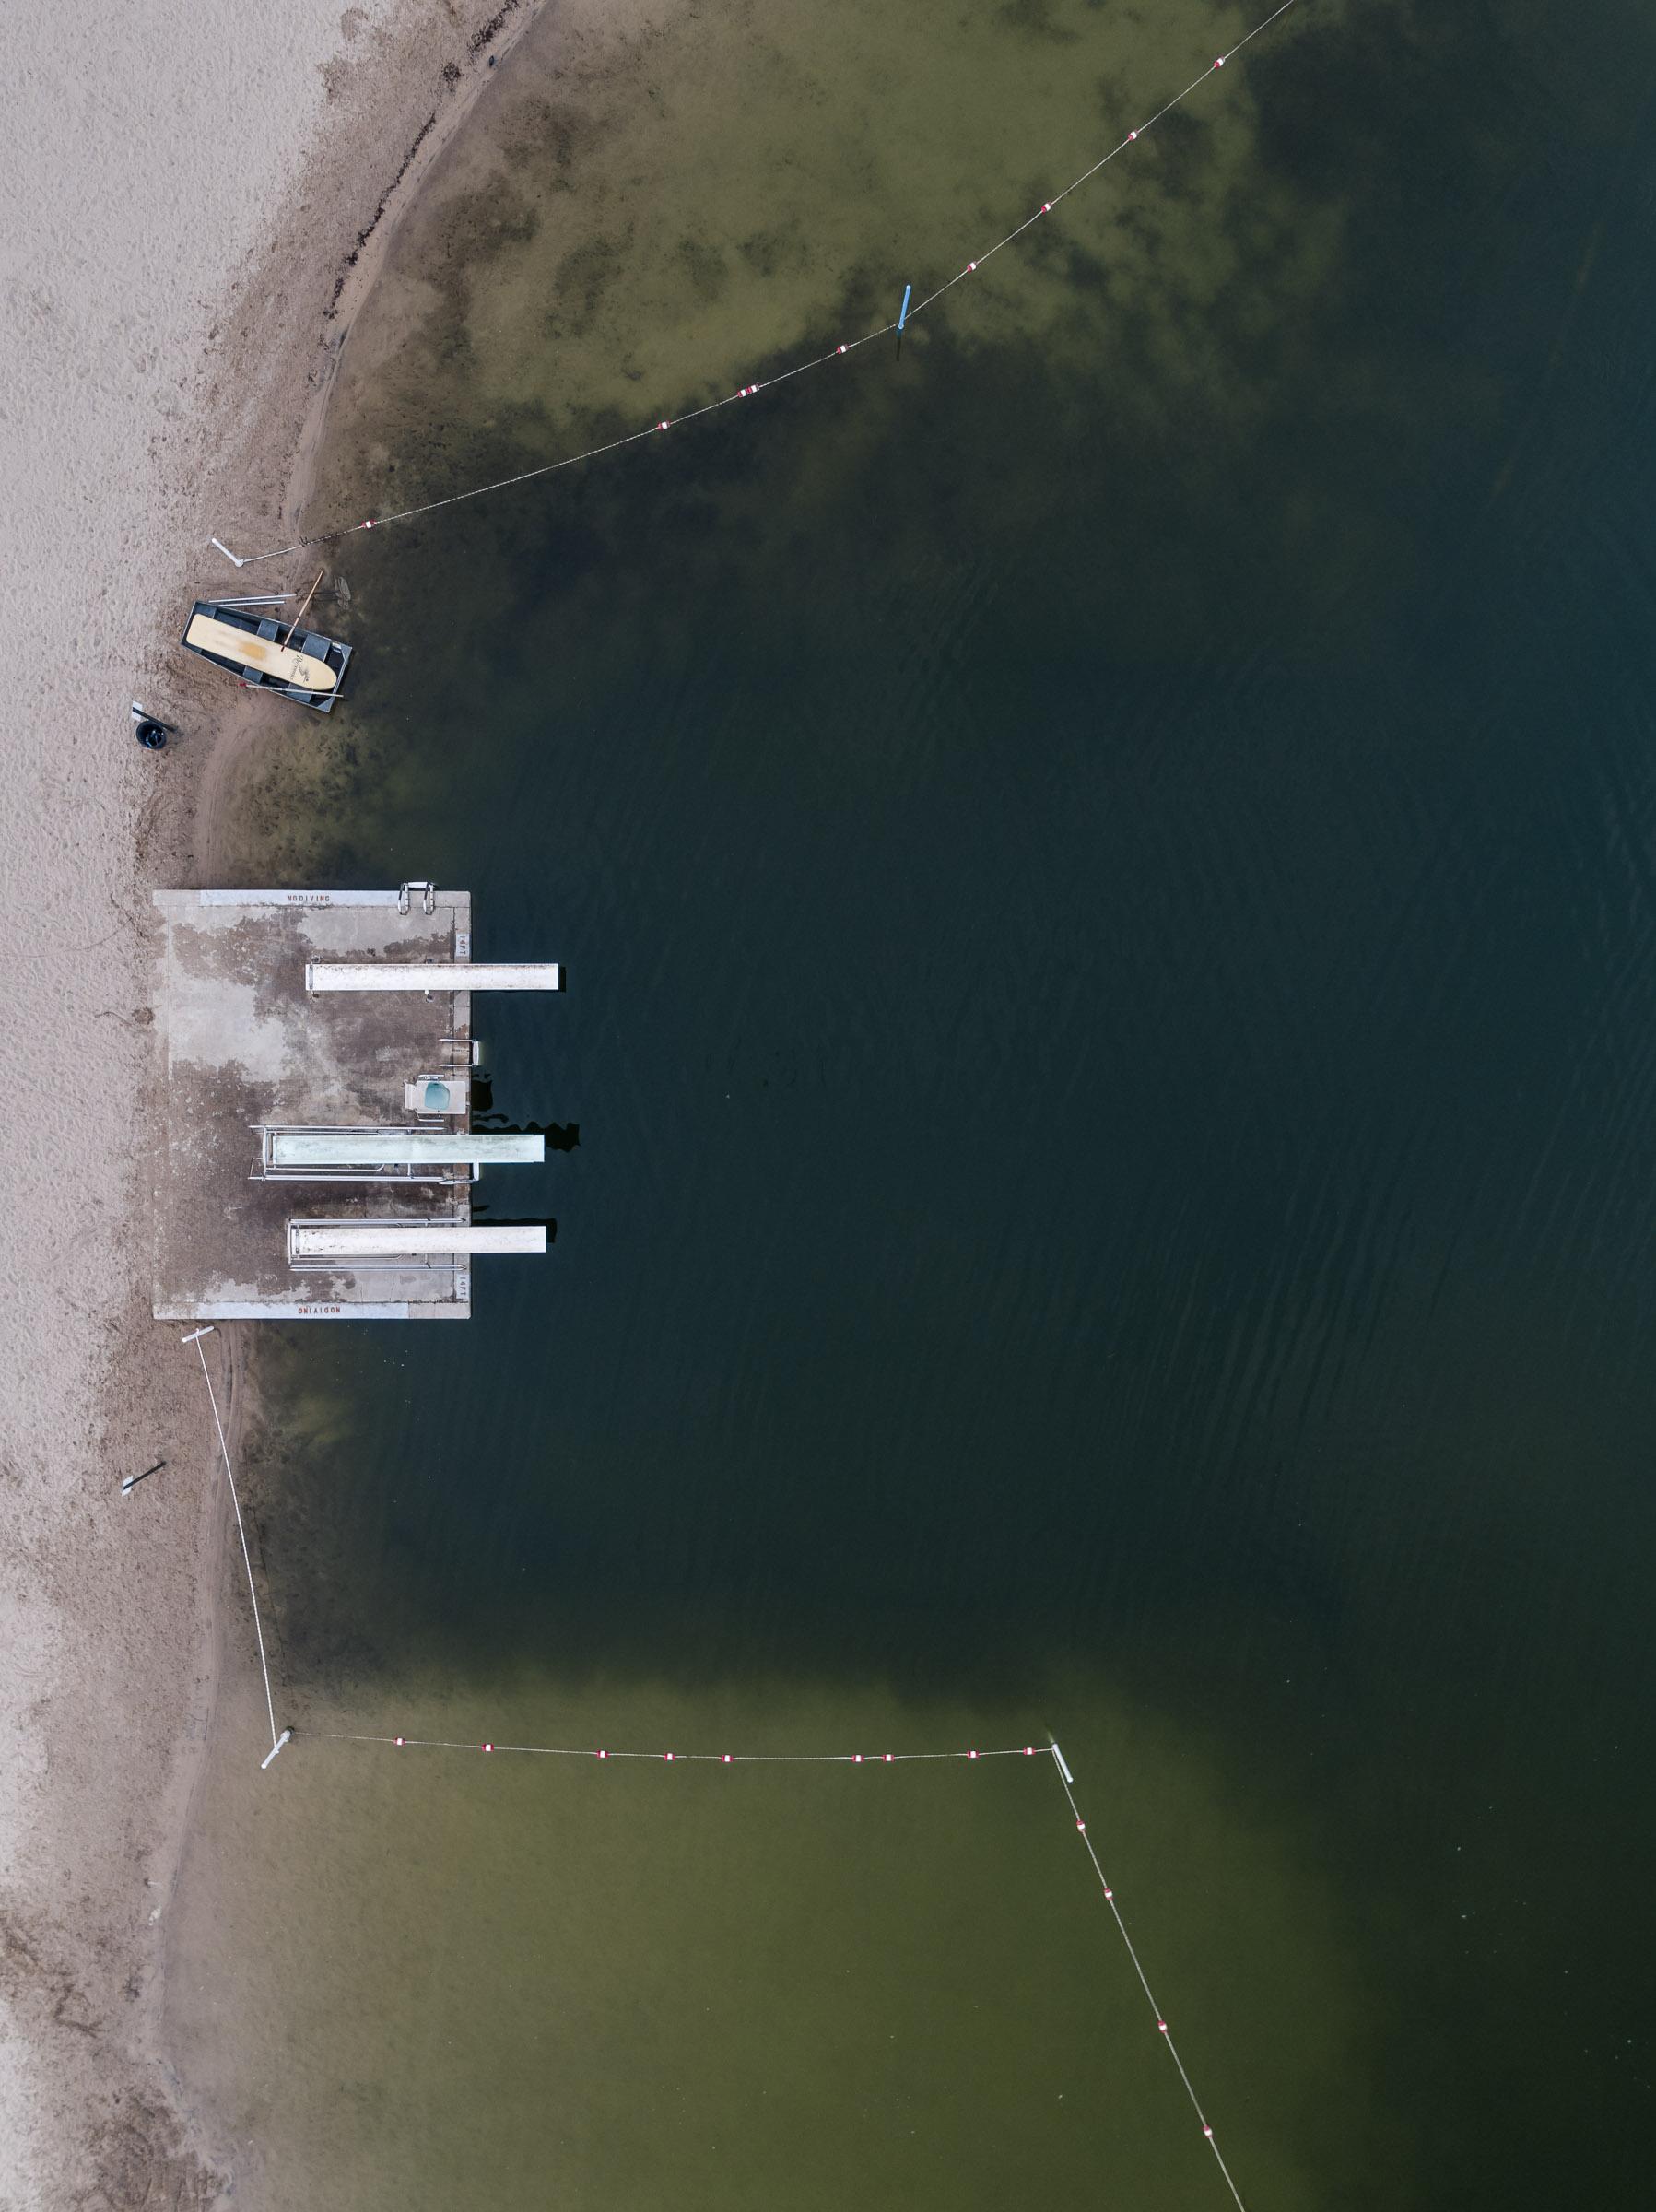 pomptonplainslake_typoland_aerial-3.jpg